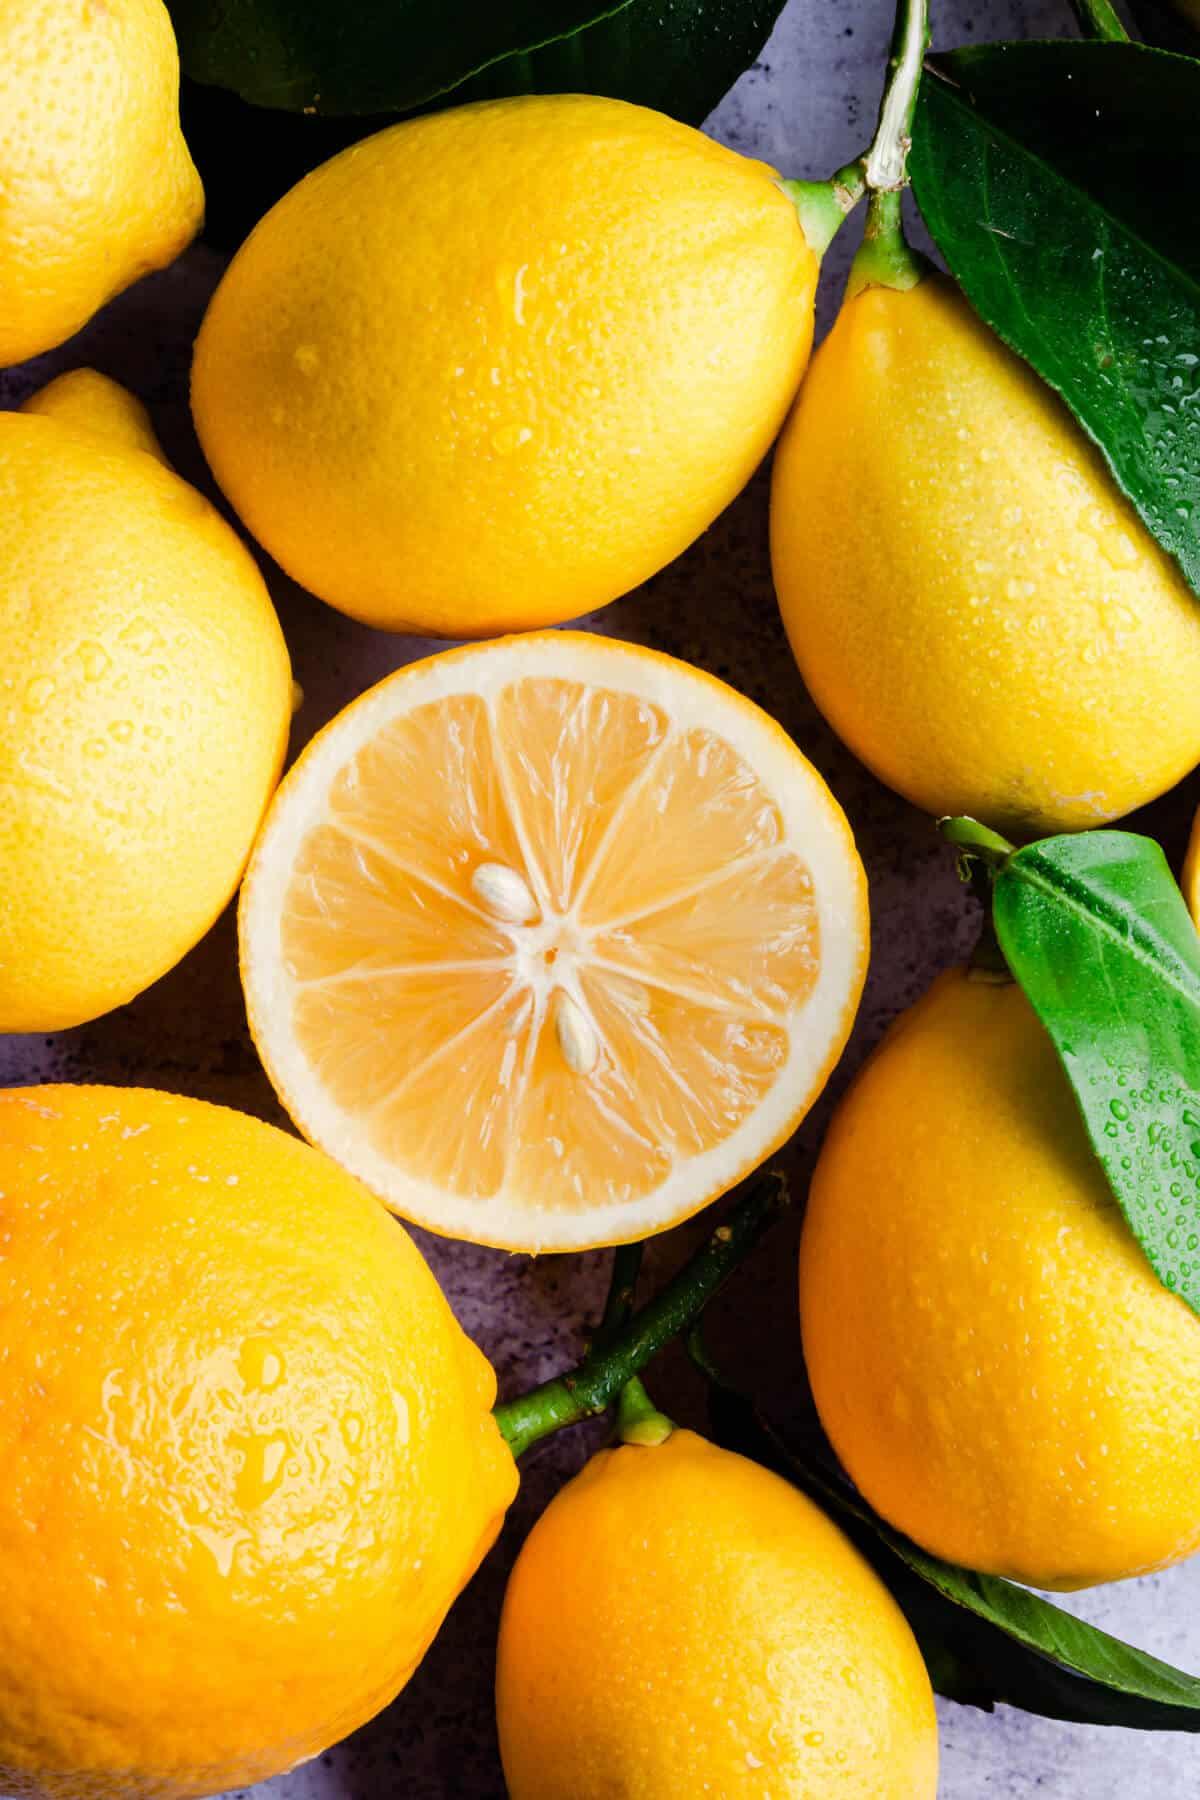 top view super close up at fresh lemon half surrounded by whole lemons